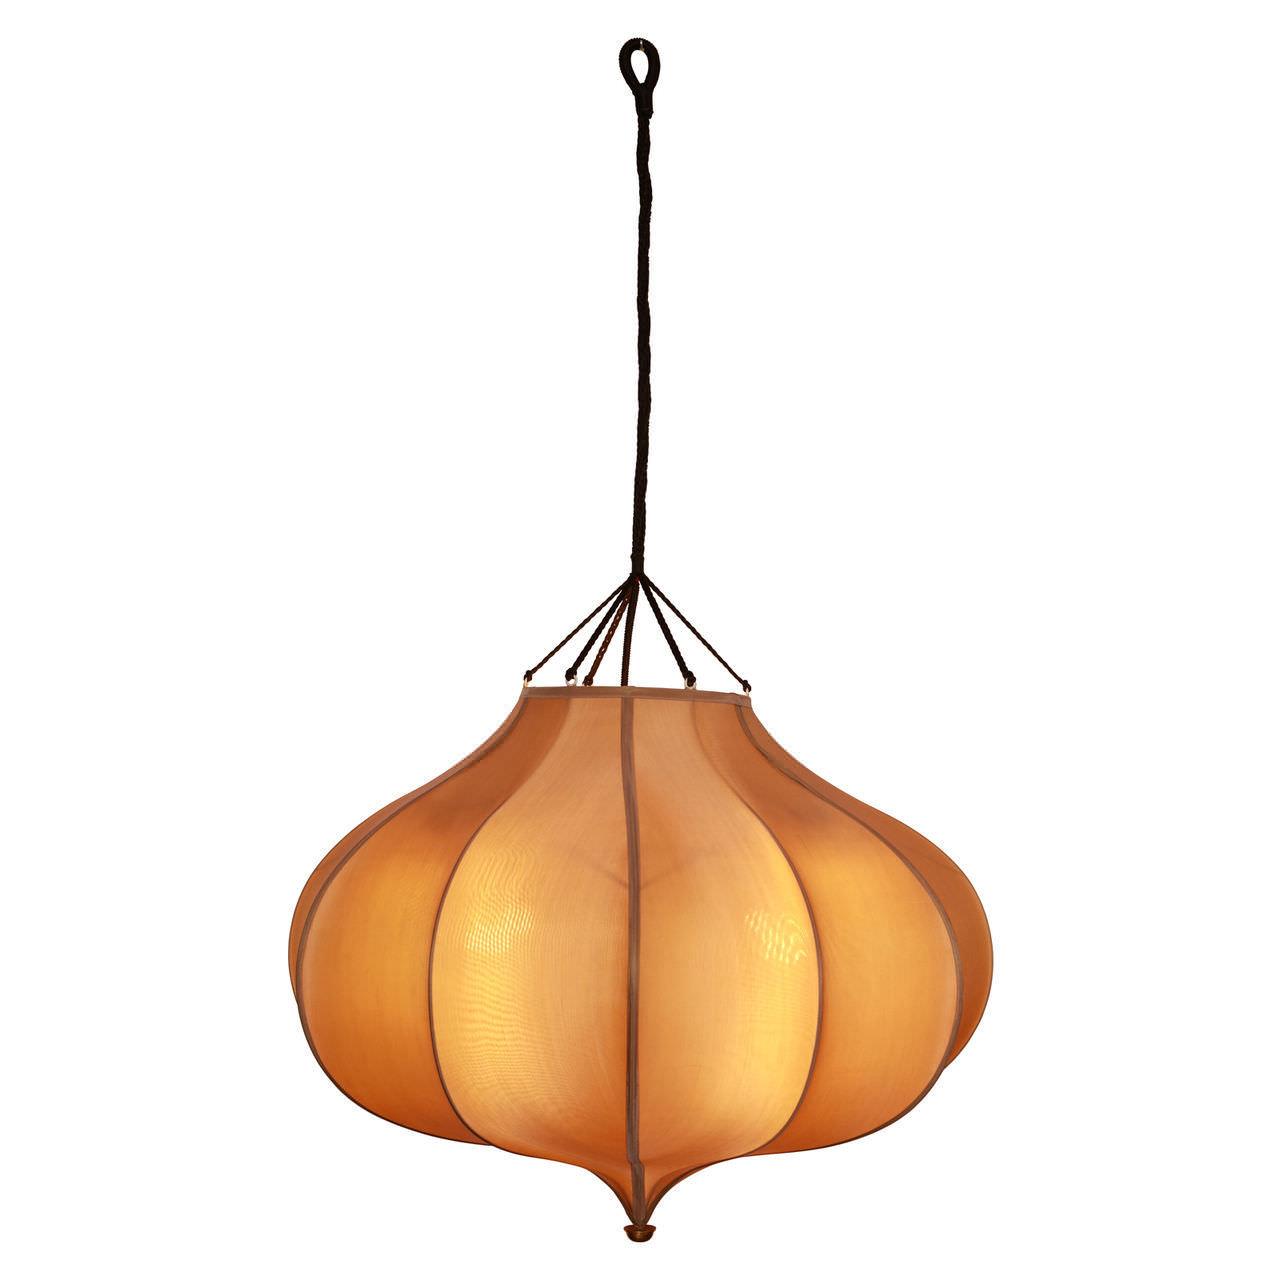 Pendant lamp contemporary silk incandescent lotus gong pendant lamp contemporary silk incandescent lotus aloadofball Image collections